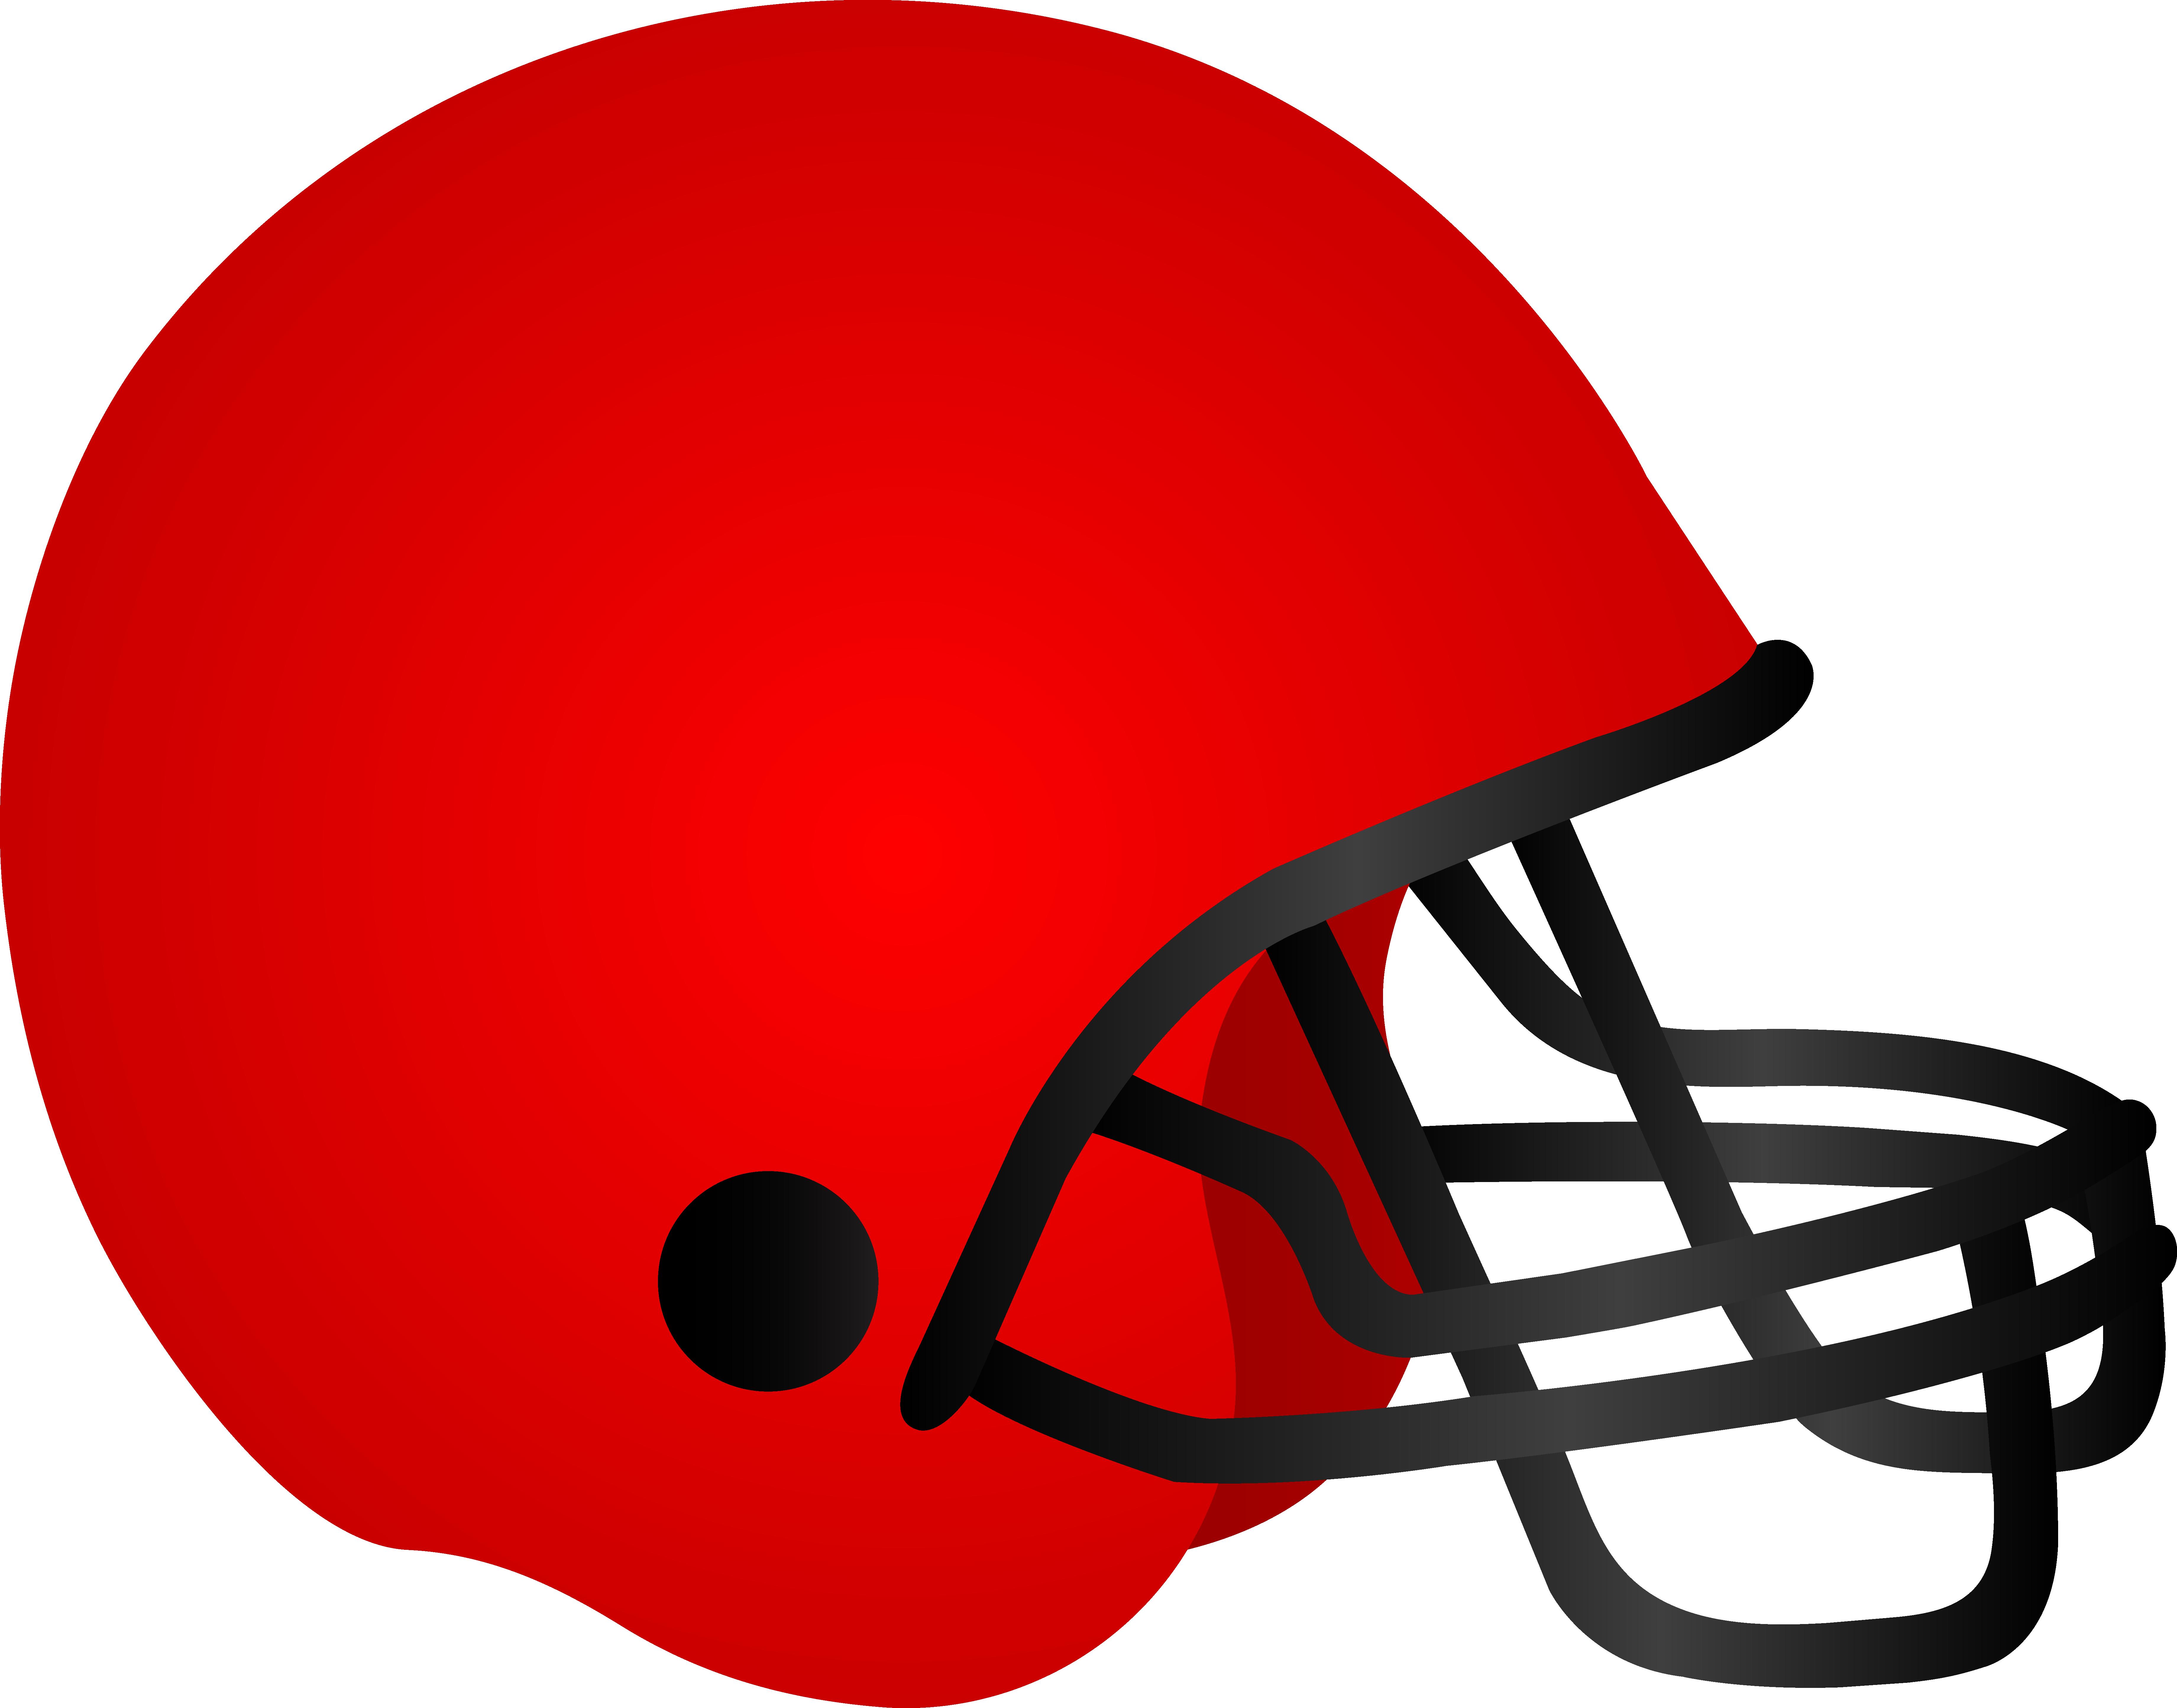 7362x5777 Red Football Helmet